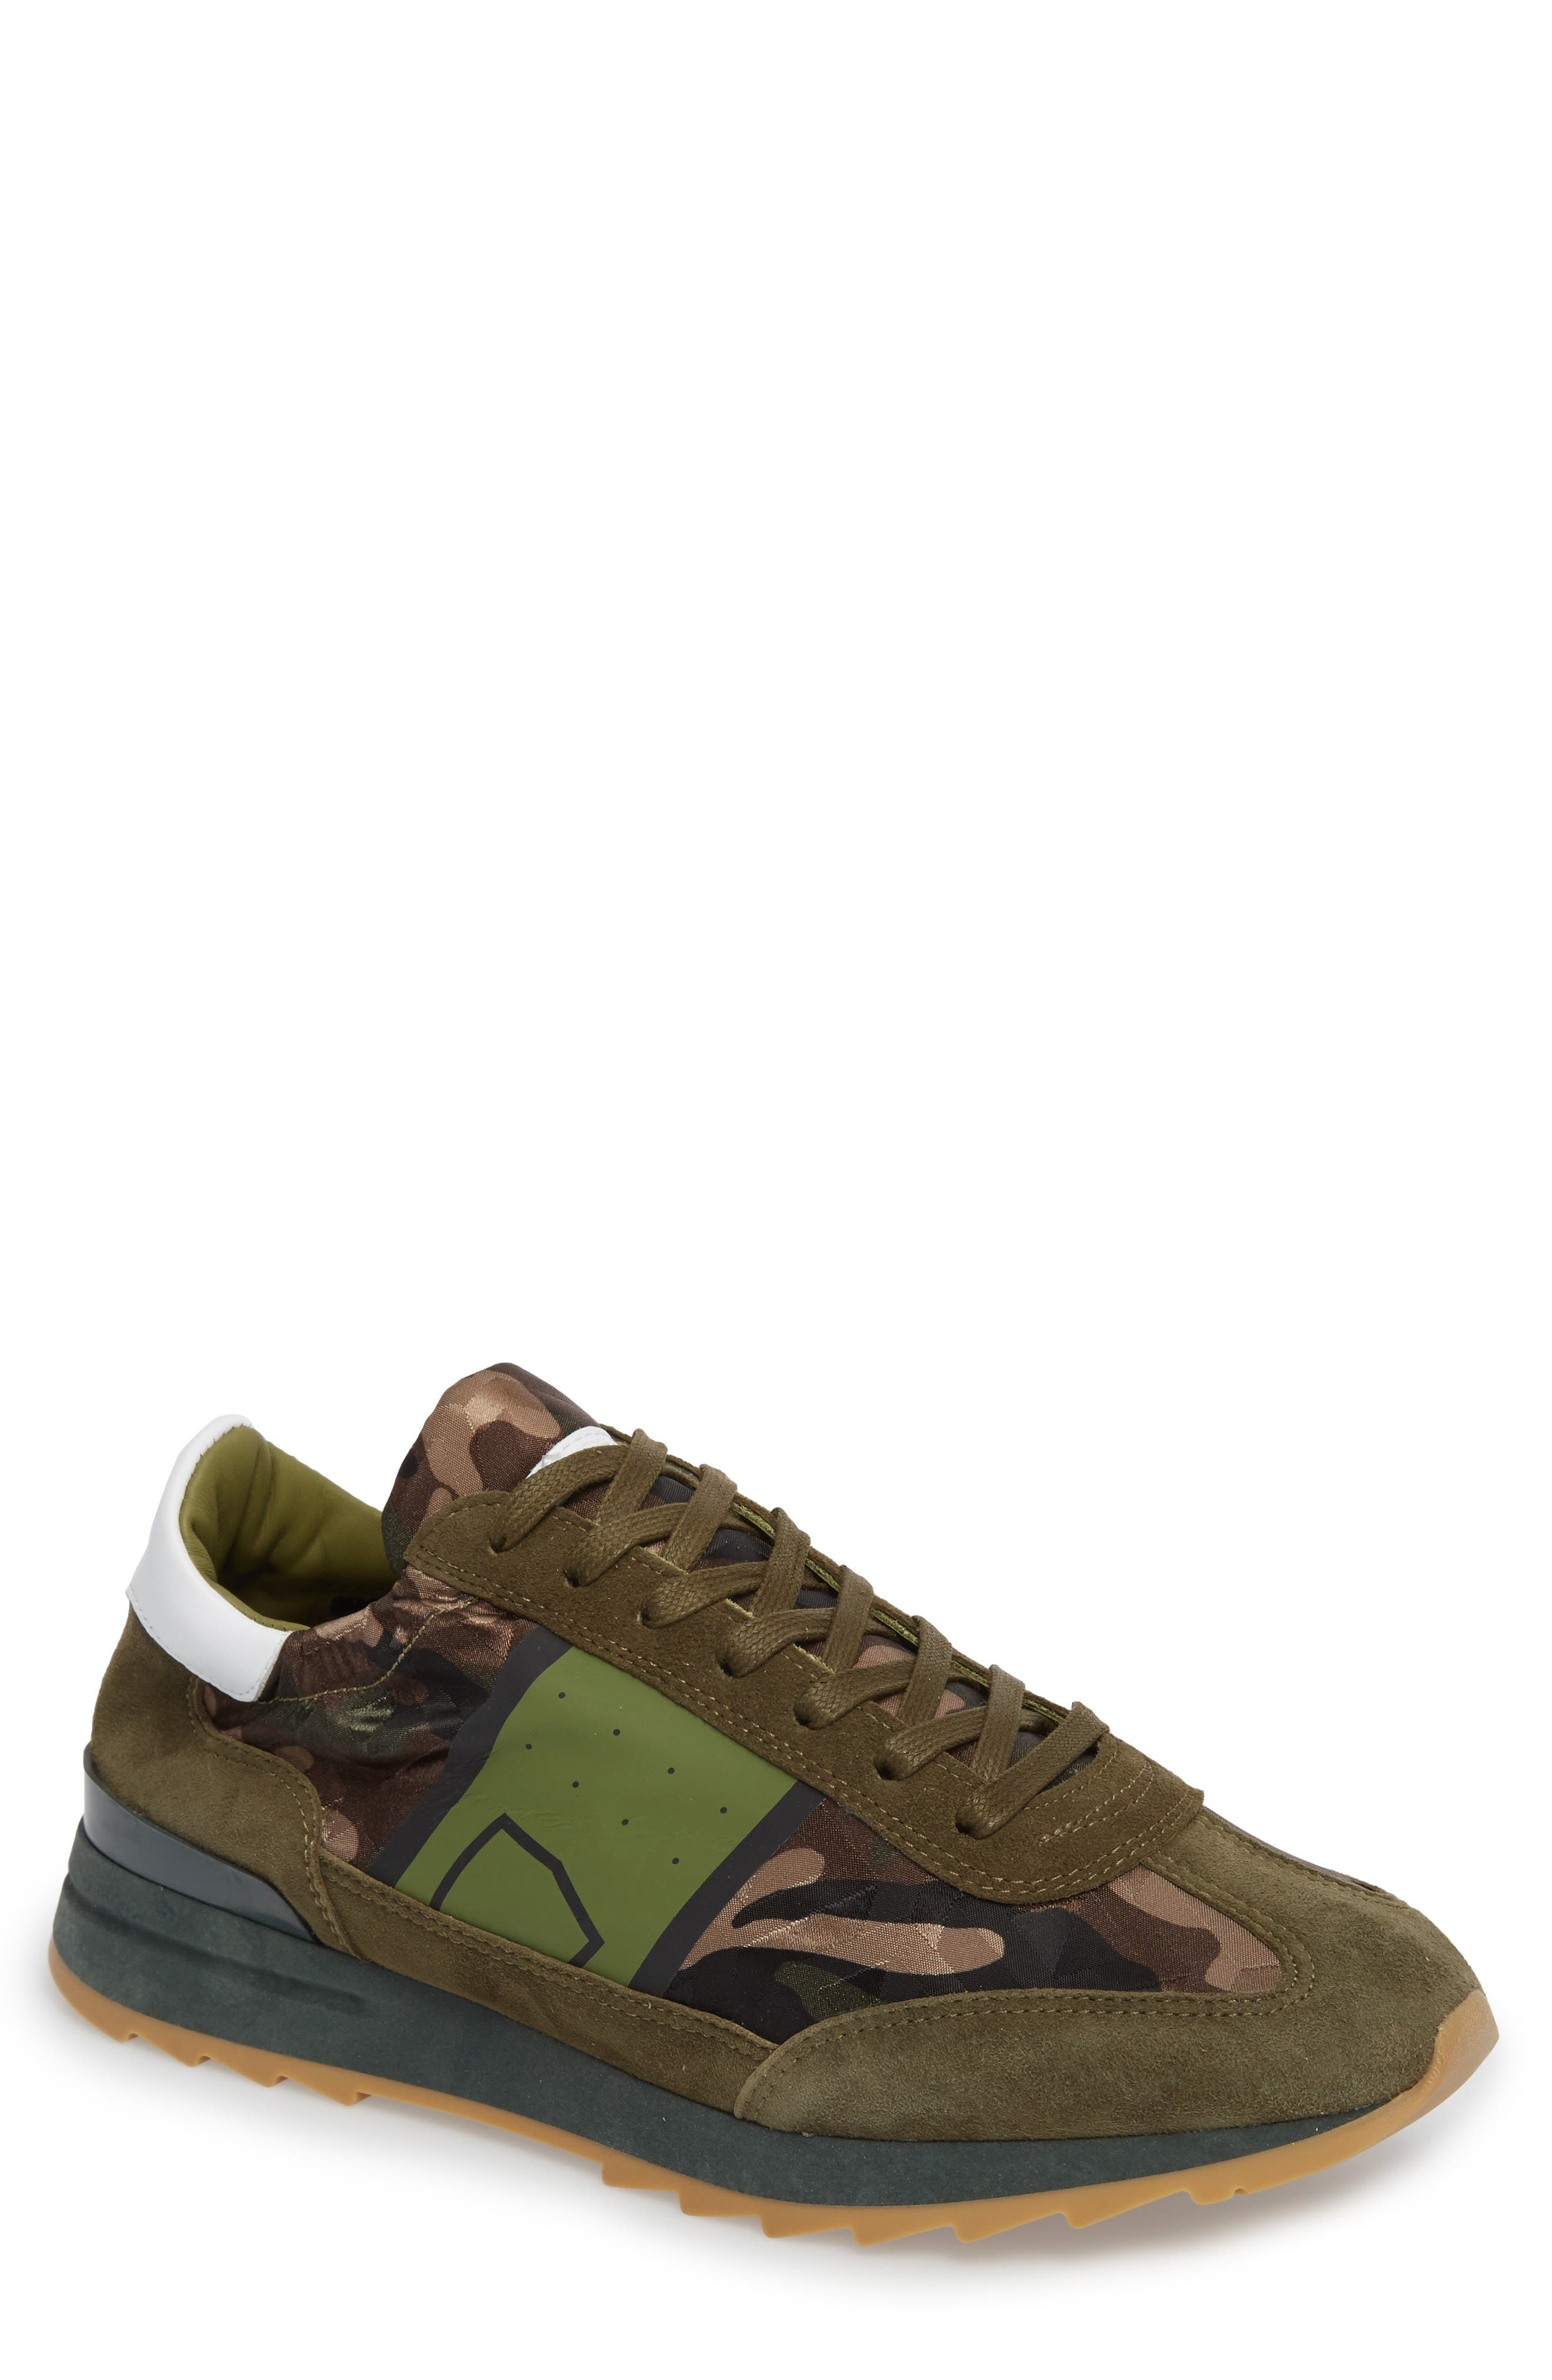 Toujours Sneaker,                             Main thumbnail 1, color,                             340